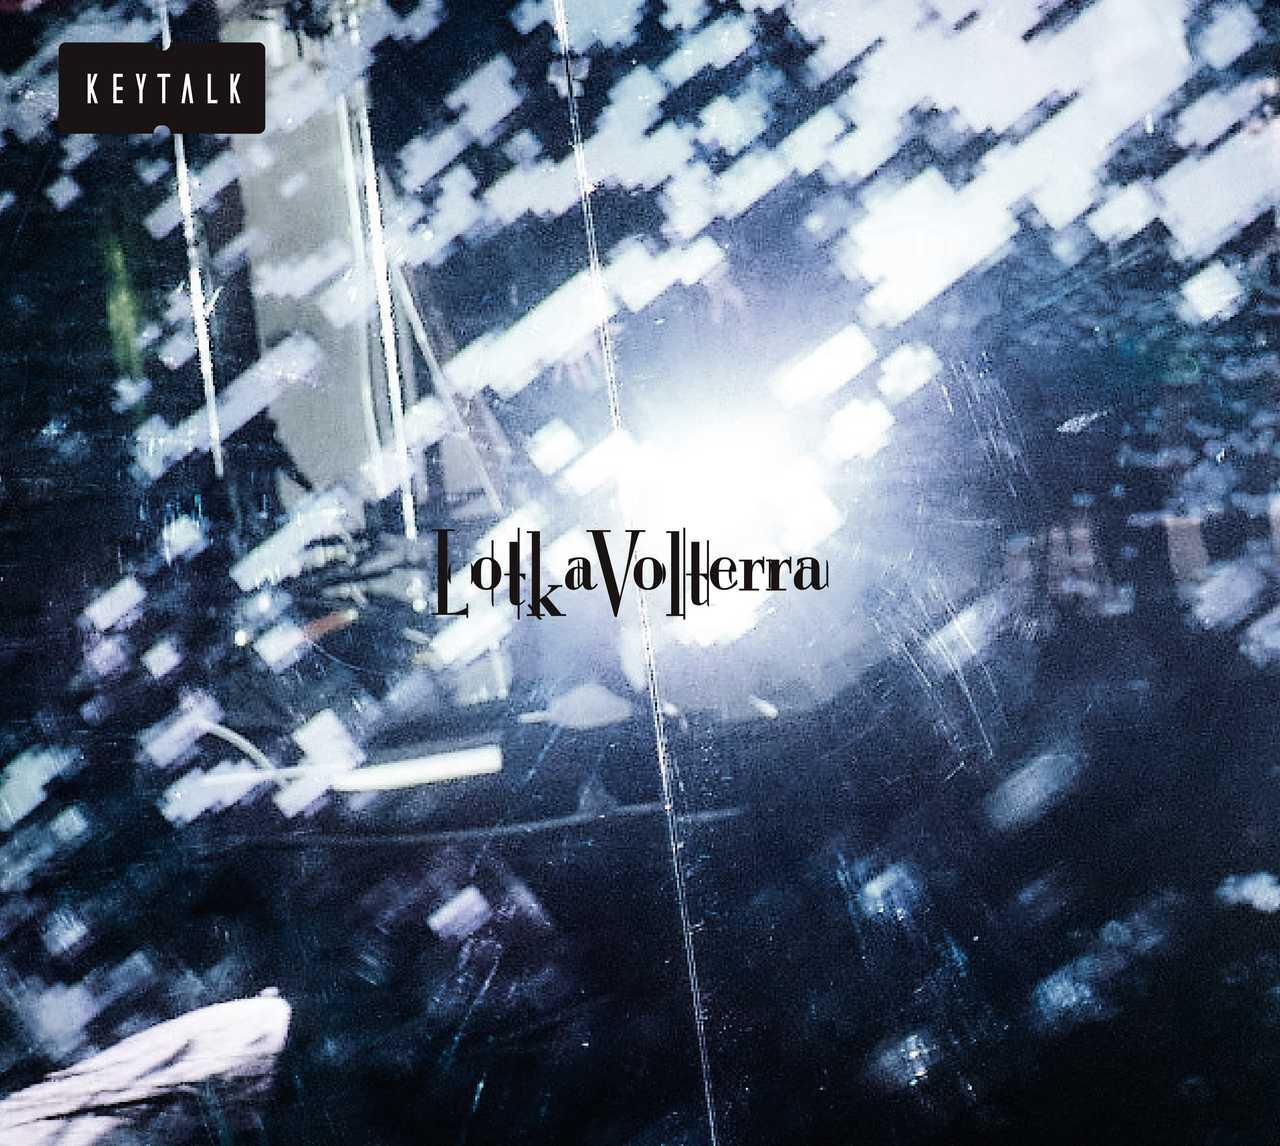 KEYTALK 1/24発売シングル「ロトカ・ヴォルテラ」 MUSIC VIDEOを公開!